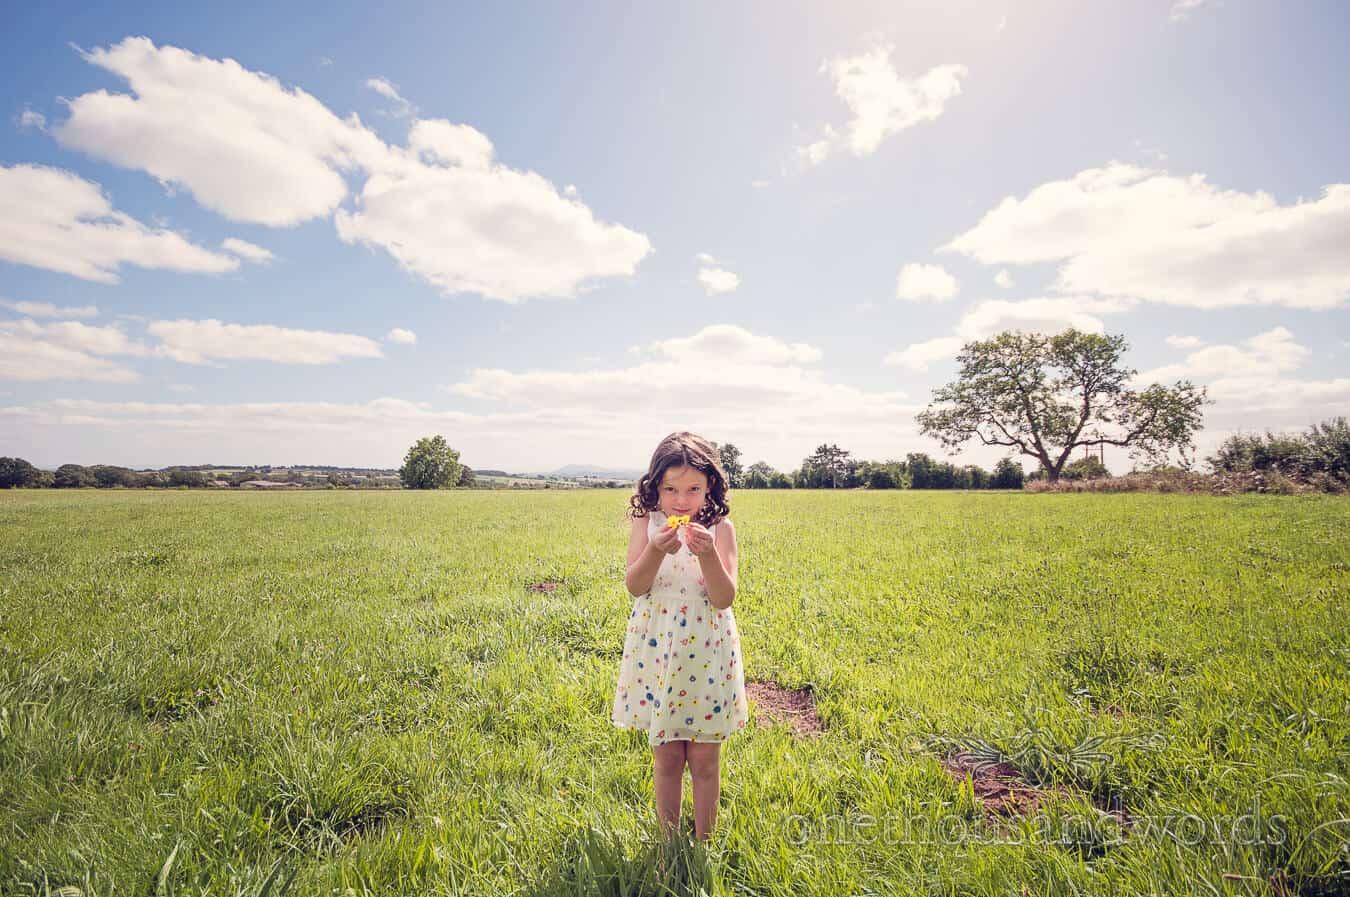 Flower girl picks flowers in field on morning of Countryside Wedding